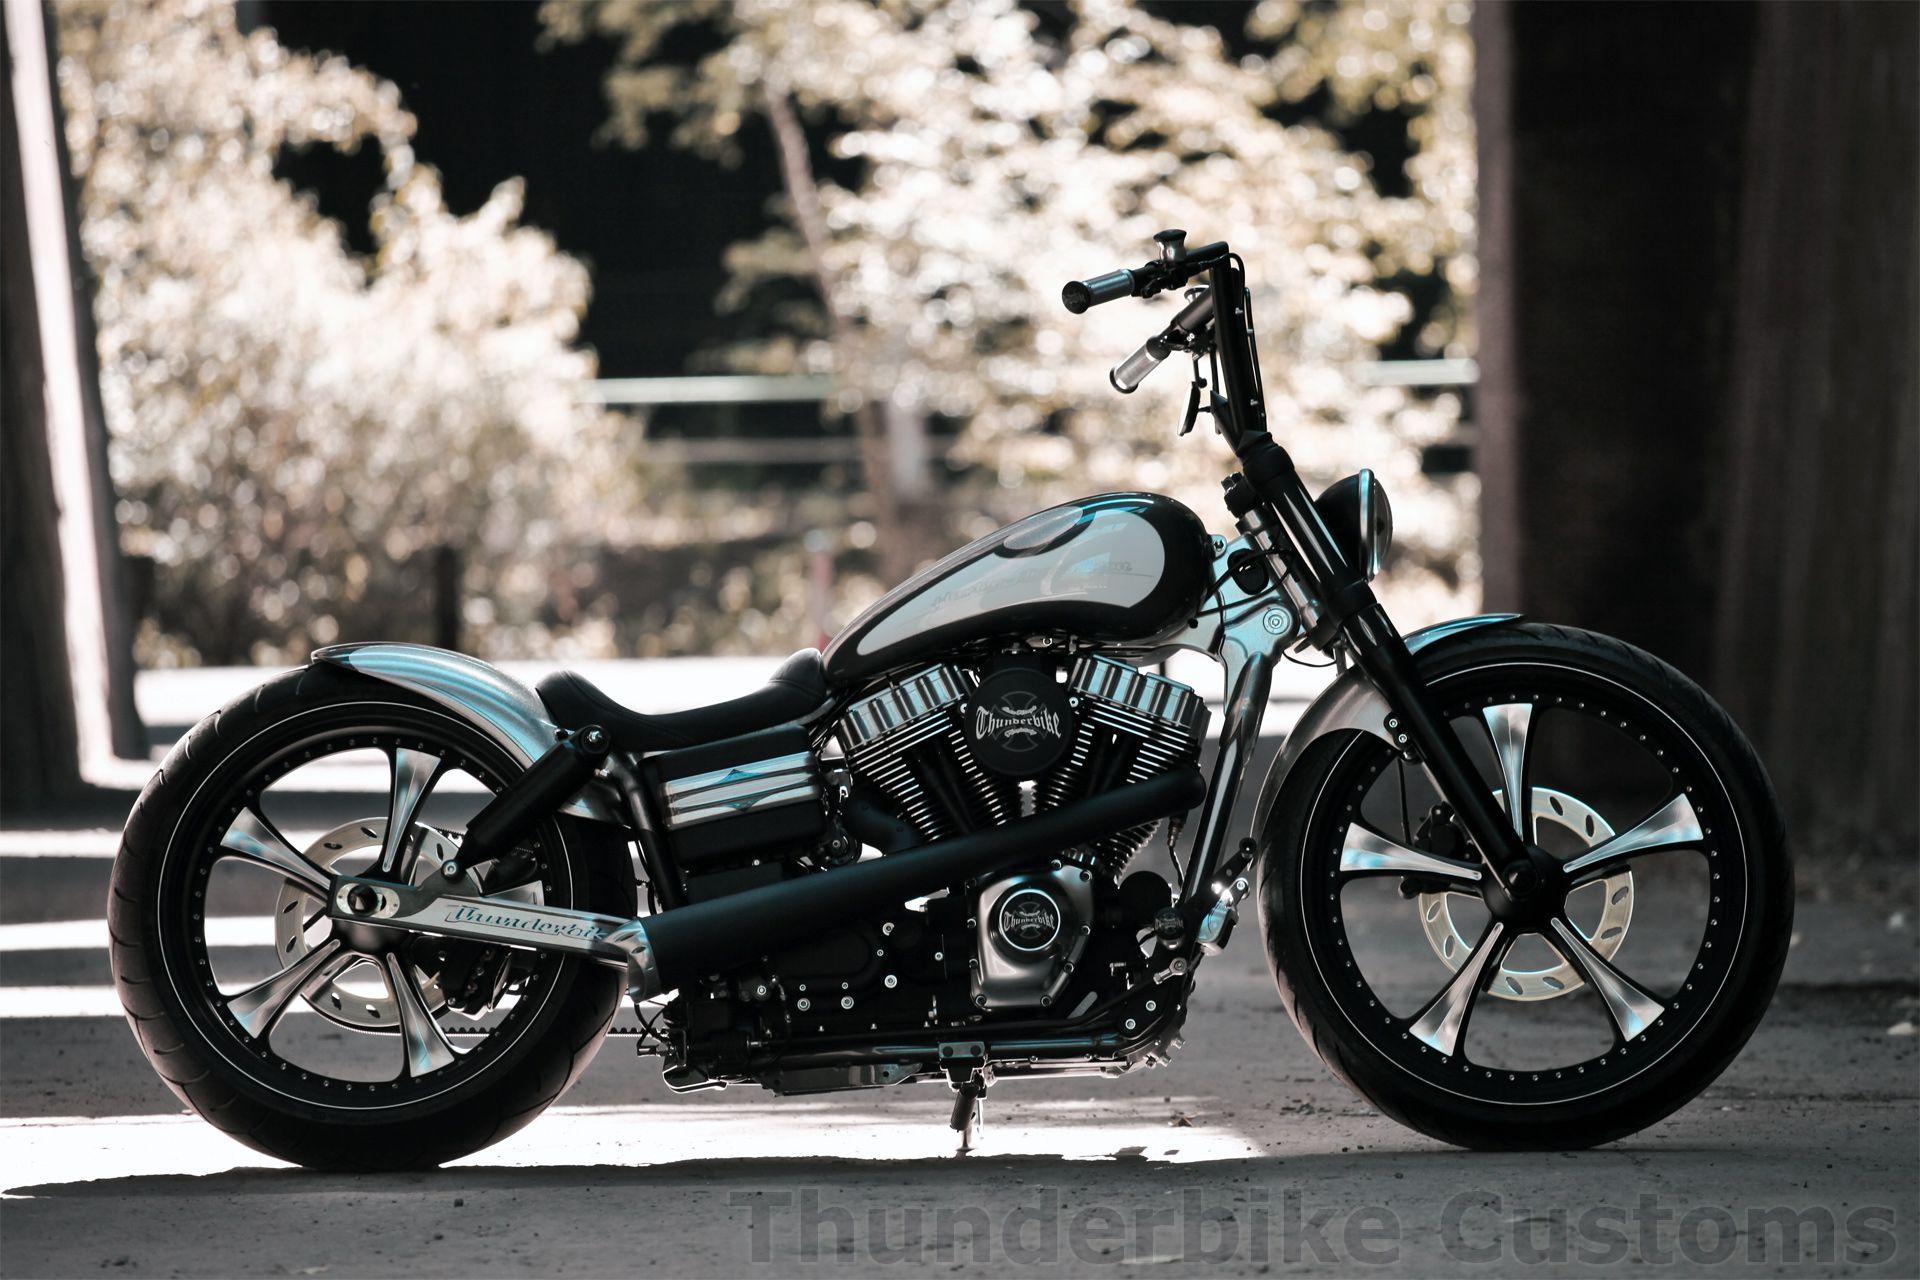 Customized Harley-Davidson Street Bob by #Thunderbike